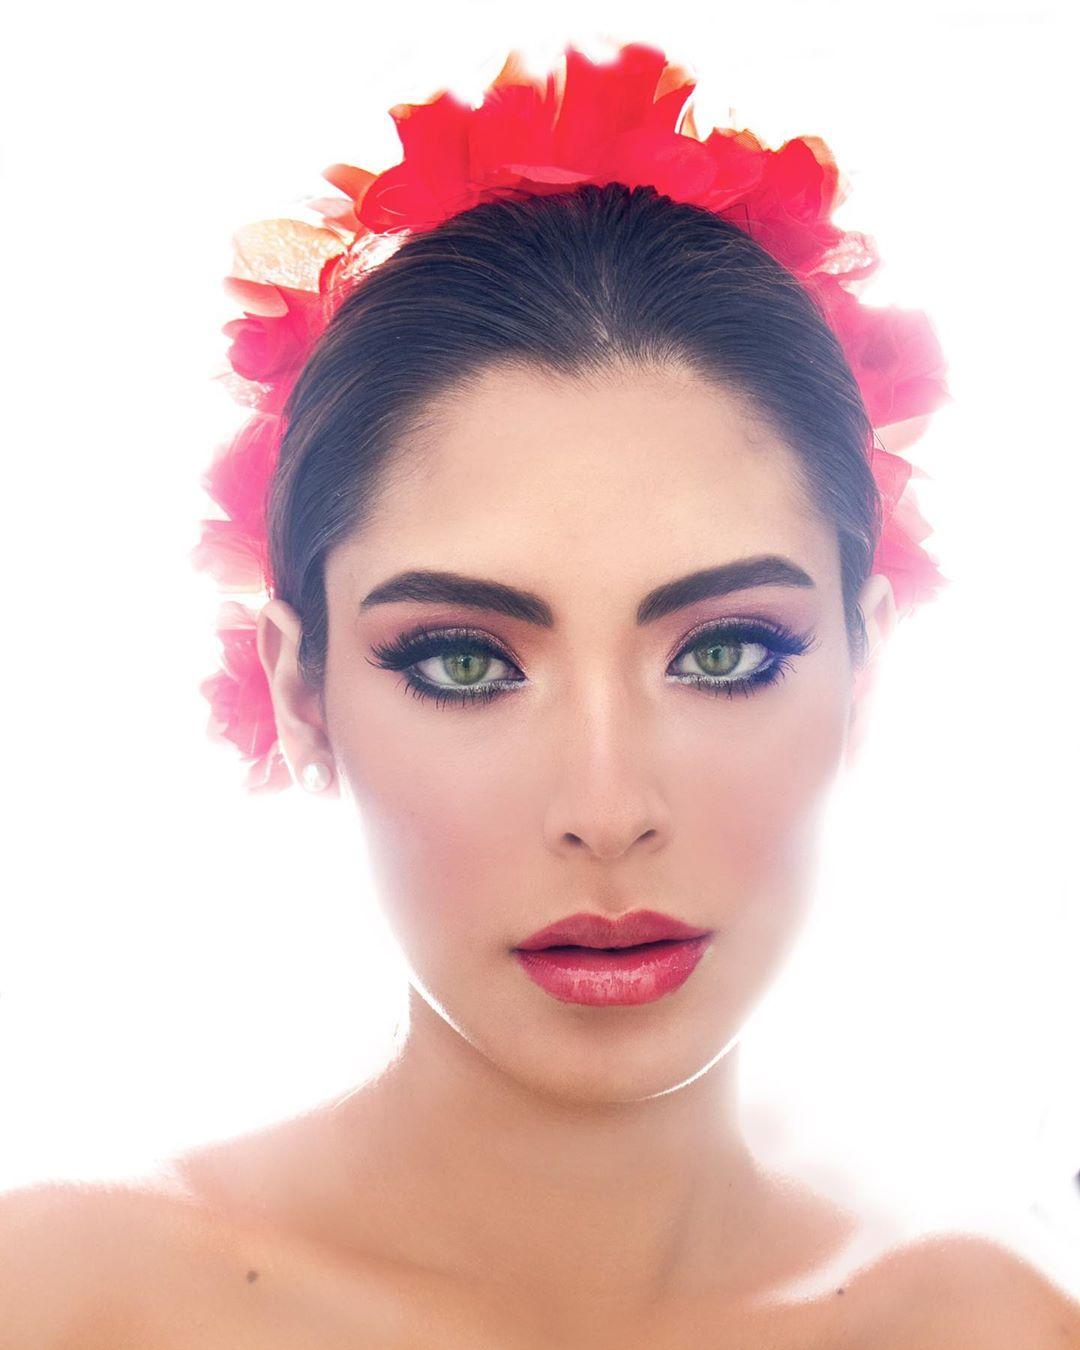 angela leon yuriar, miss grand mexico 2020. - Página 4 10657310